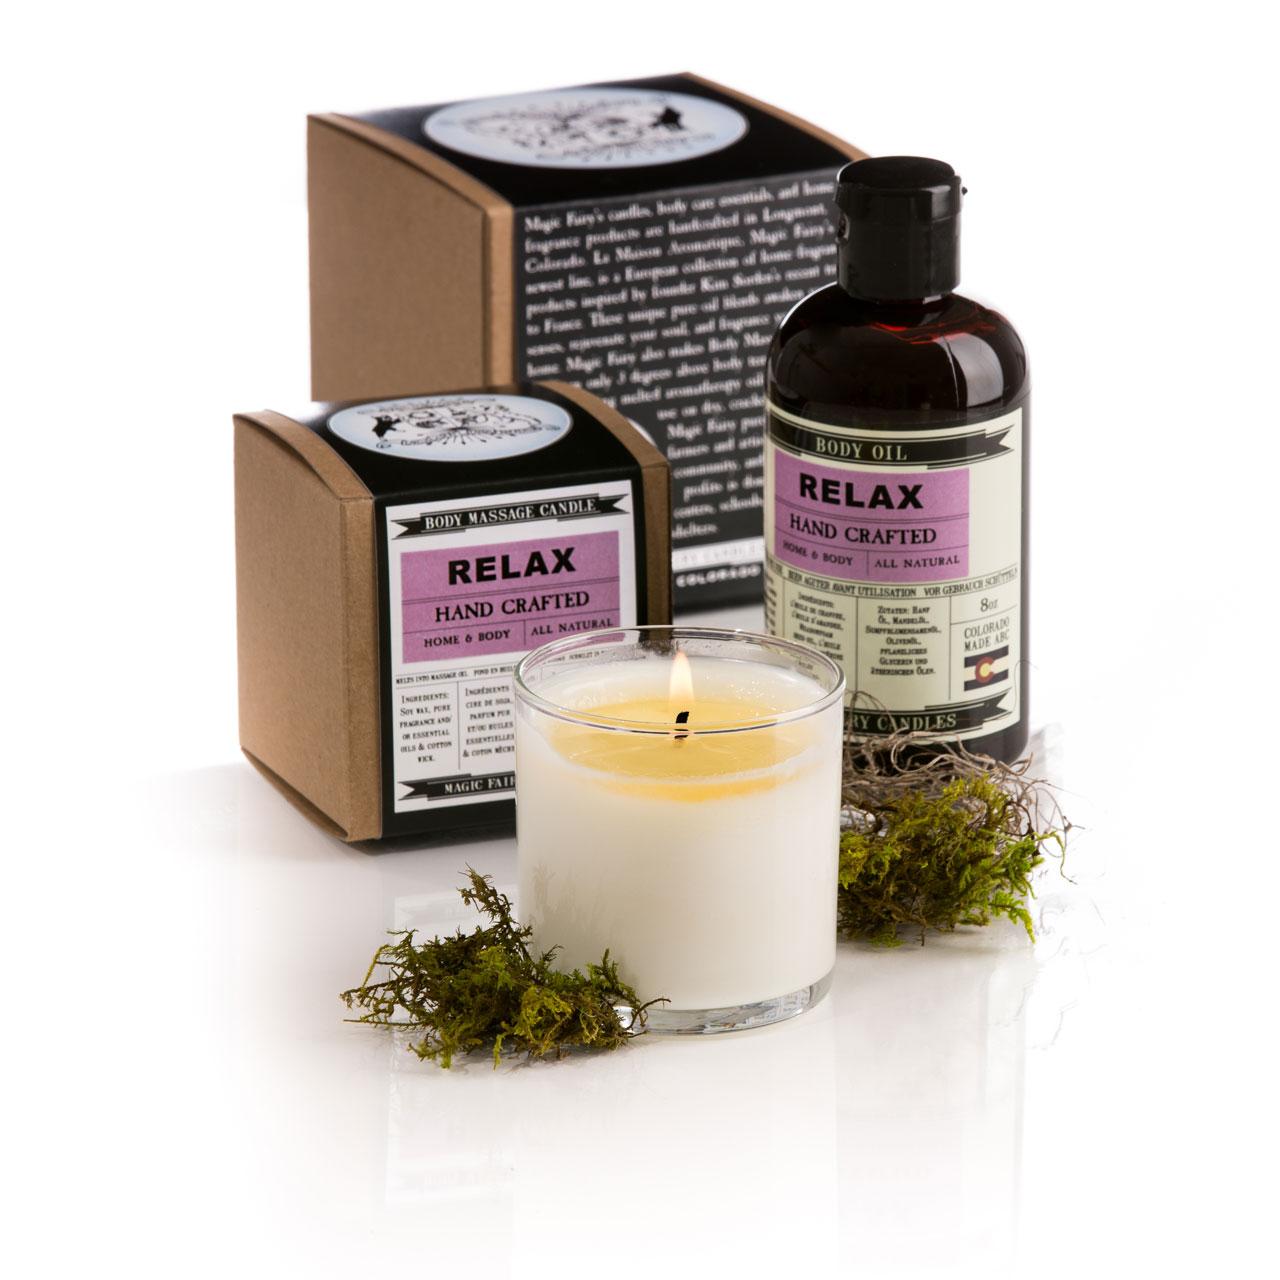 Aromatherapy-05-1-relax-full-shot